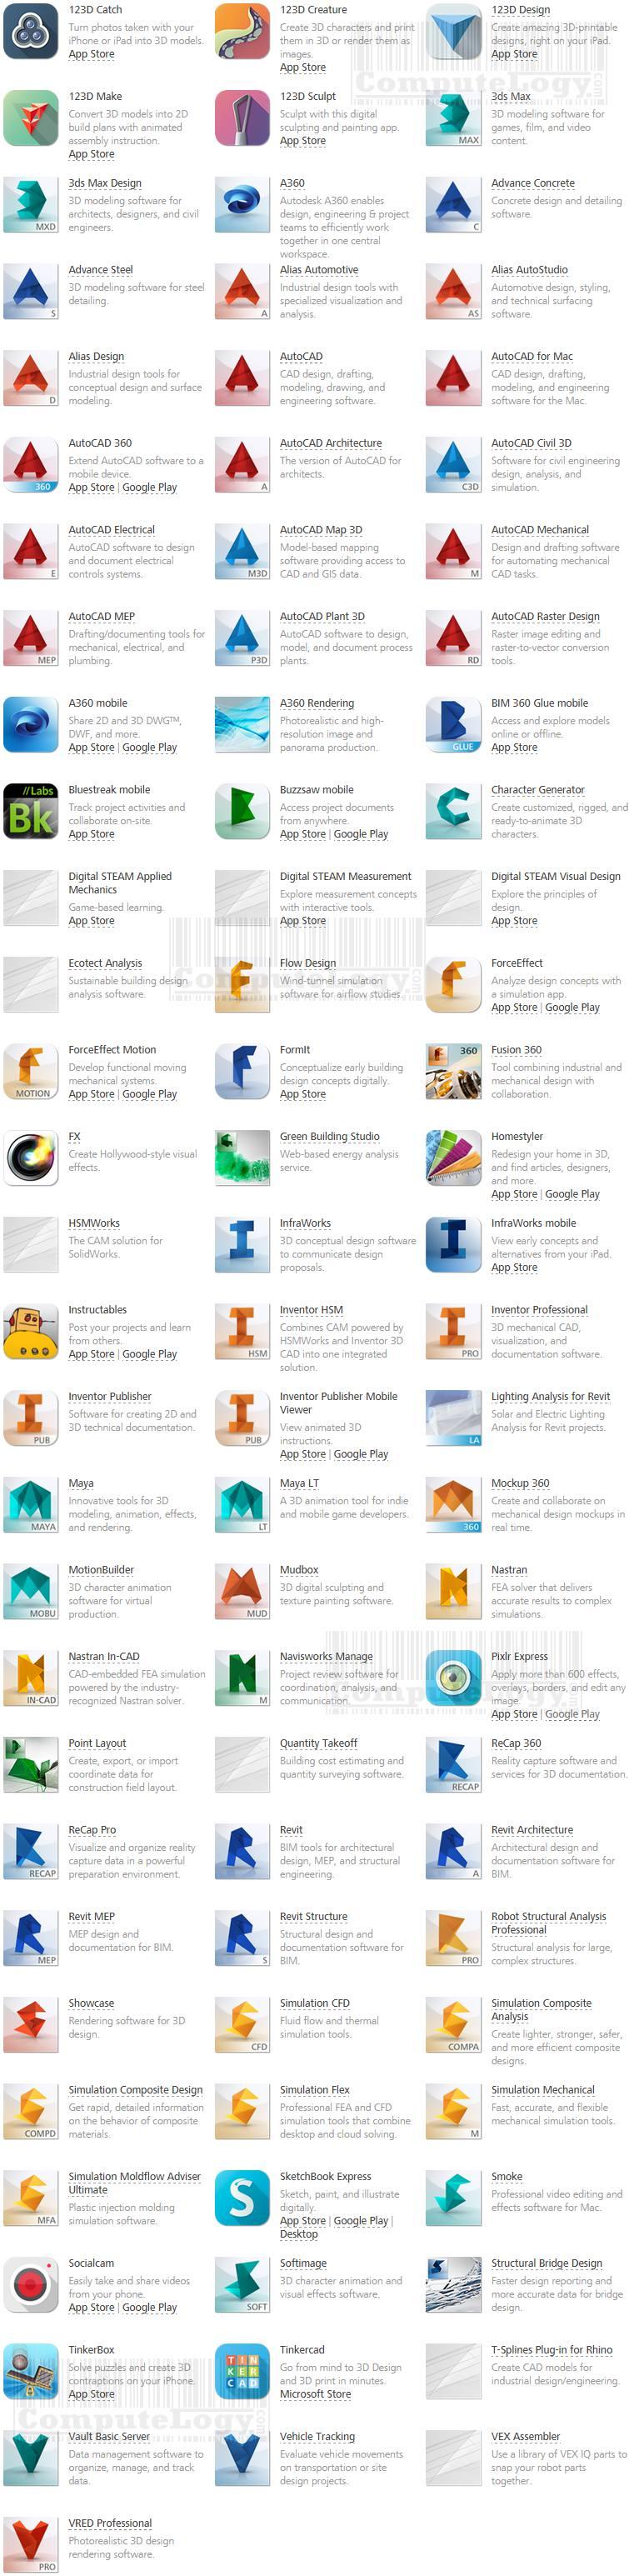 autodesk-software-list-computelogy.com